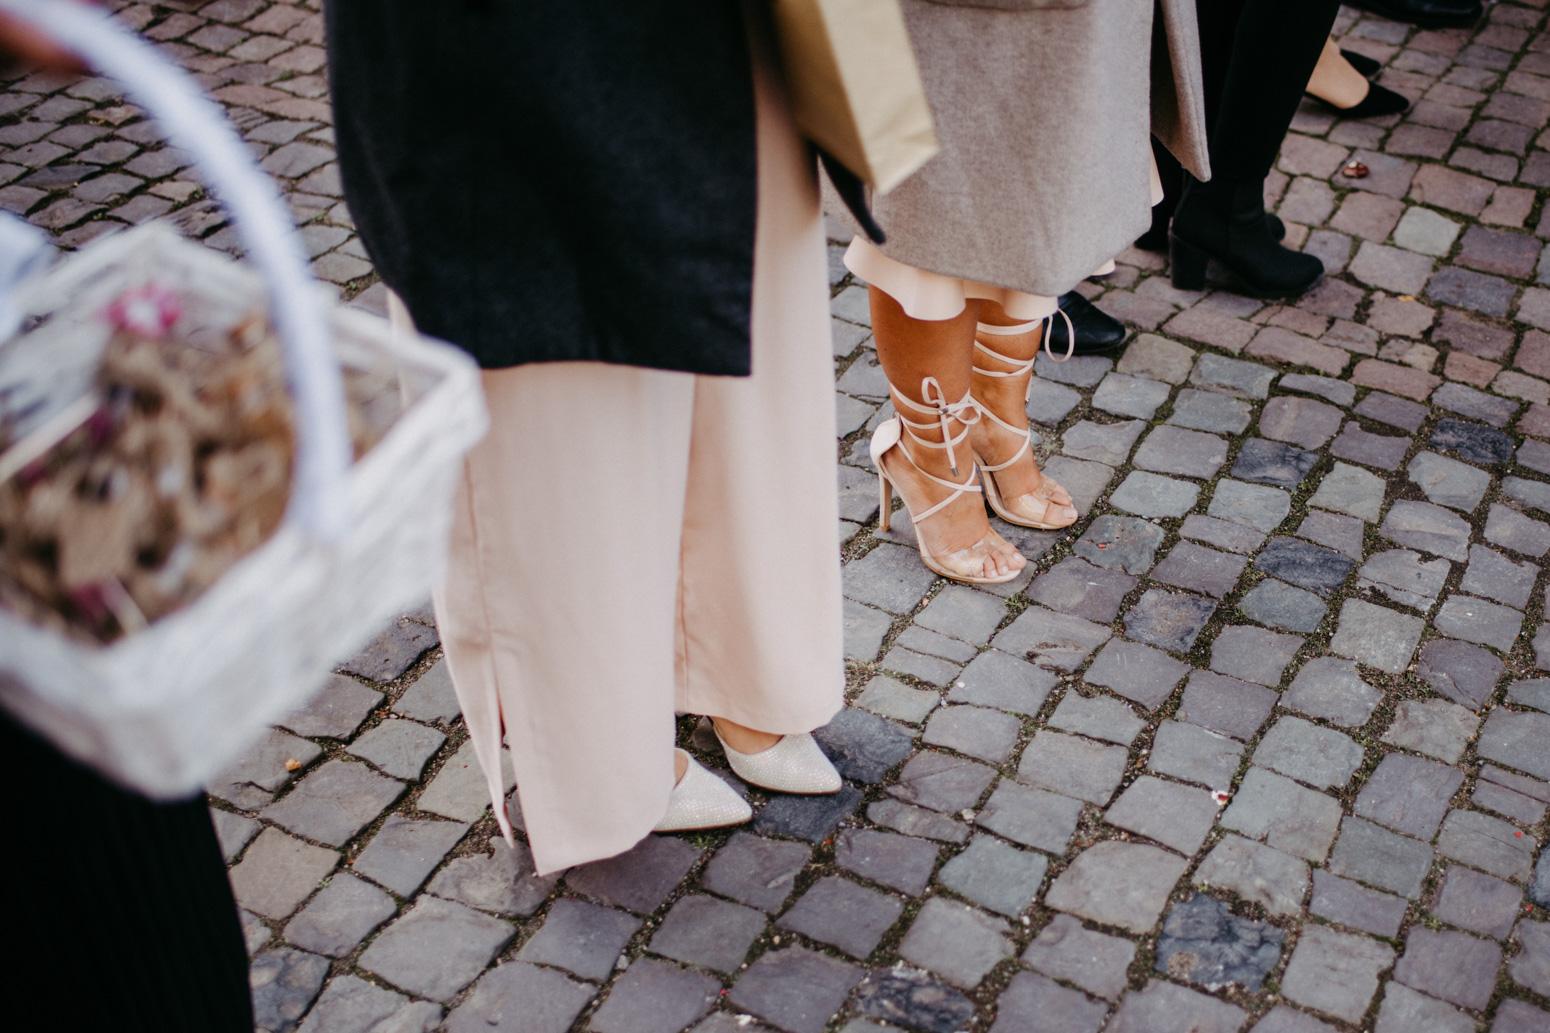 Gäste beim Auszug des Brautpaares aus dem Schloss Broich